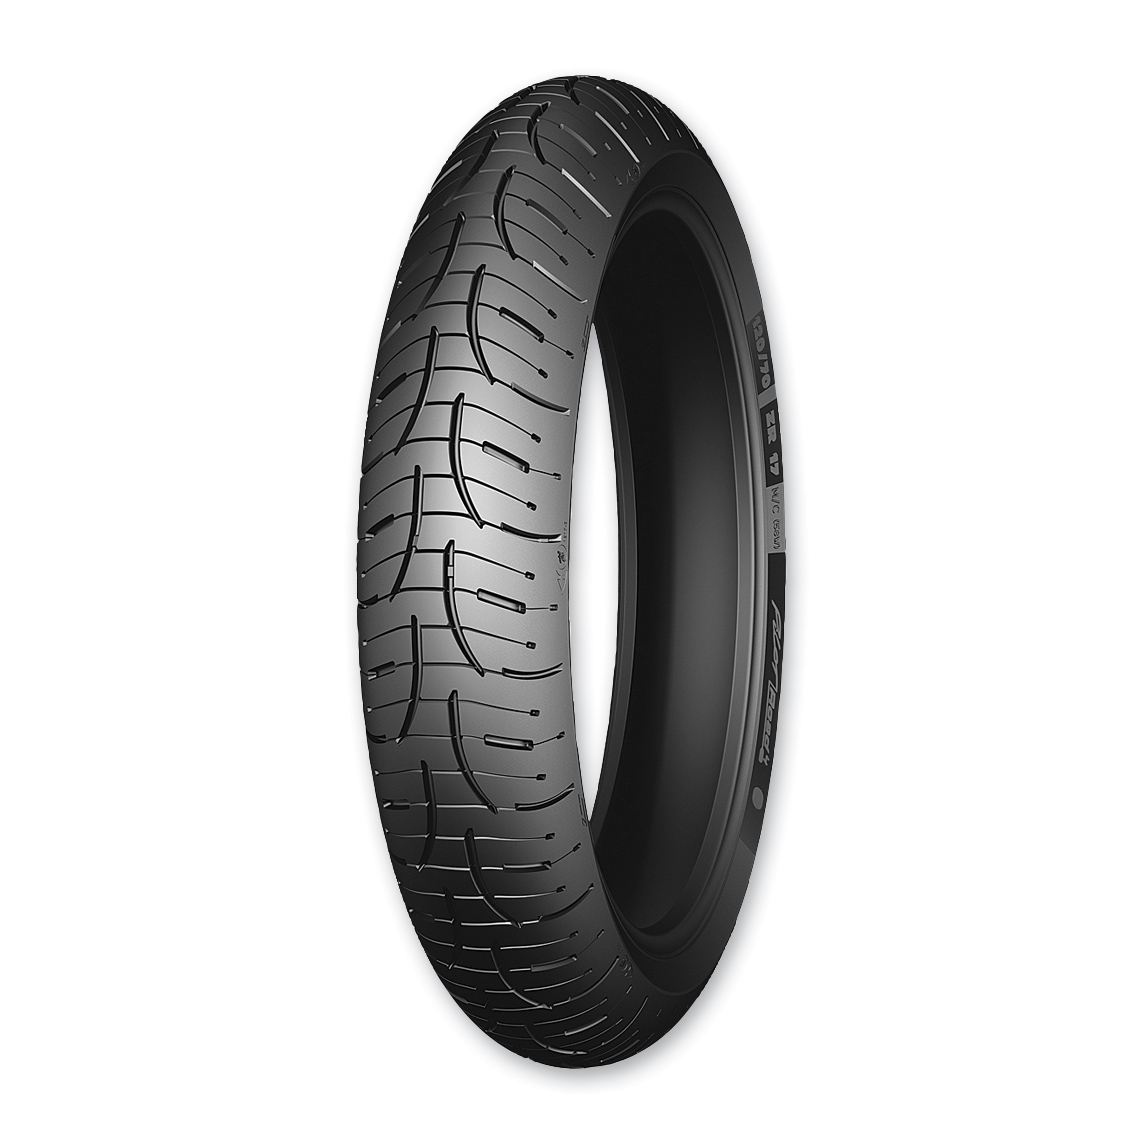 Michelin Pilot Power 120//70-ZR17 Front Motorcycle Tyre Triumph Daytona 675 R